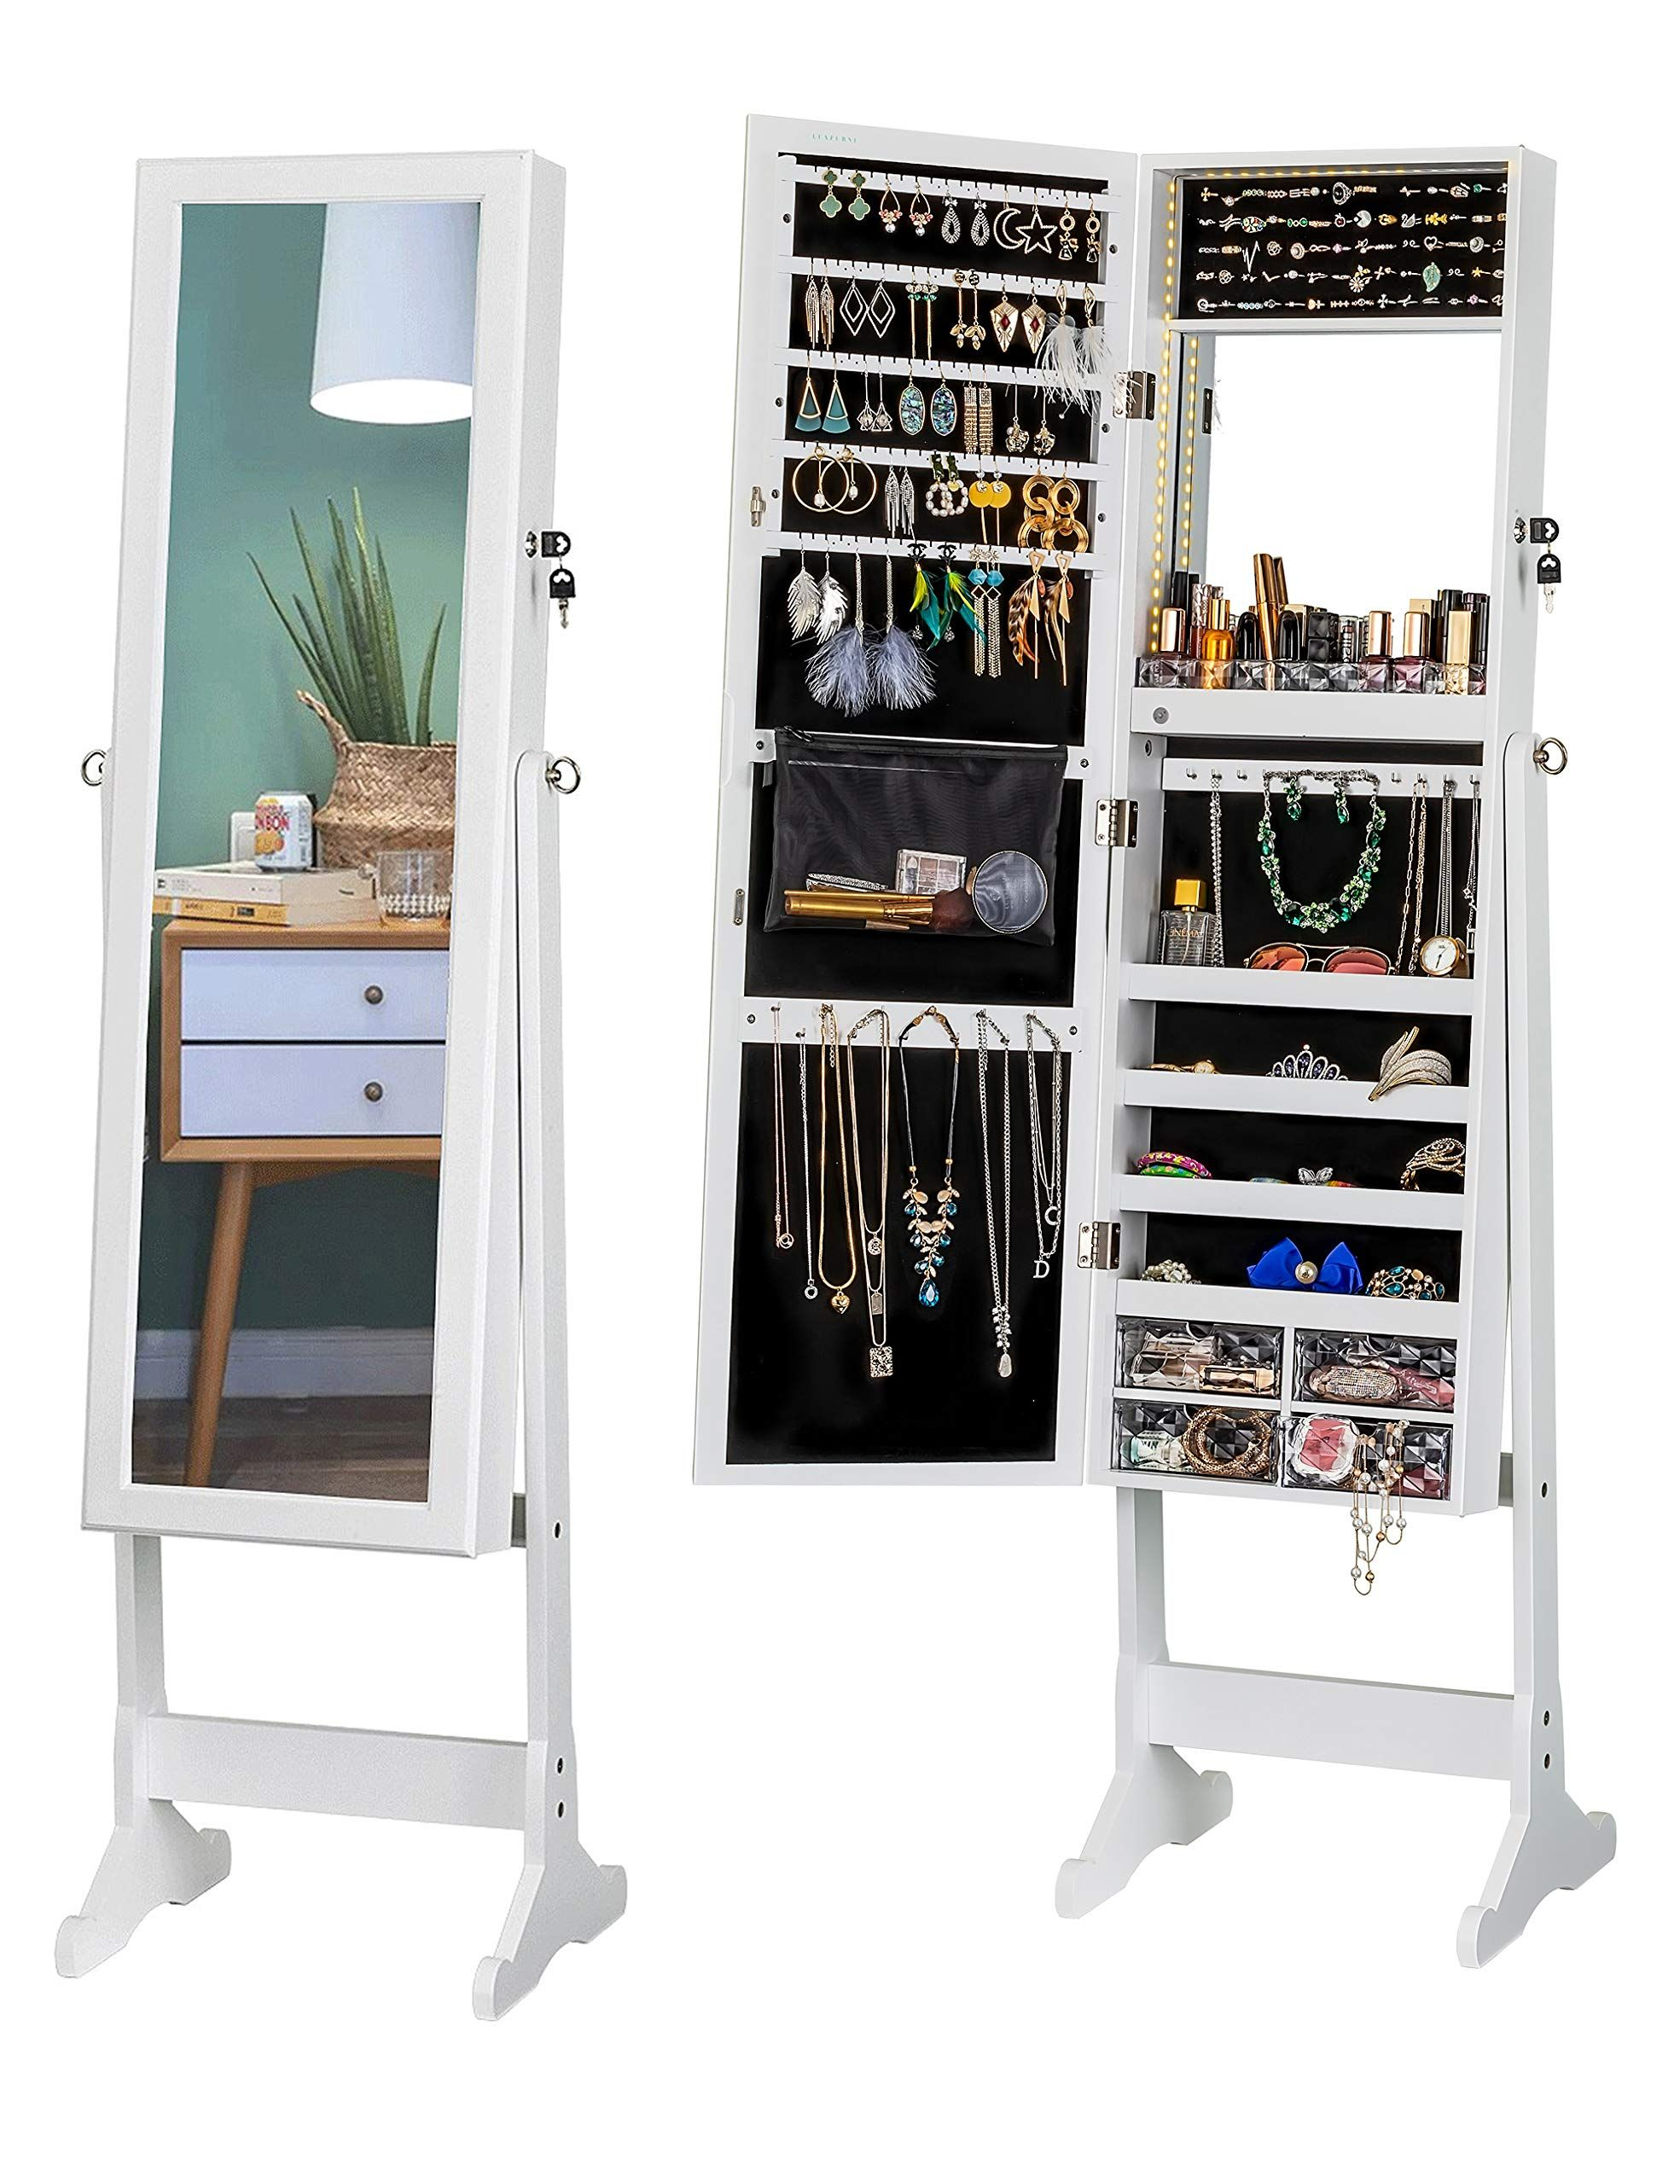 Luxfurni Led Light Jewelry Cabin Jewelry Cabinet Light Jewelry Storage Mirror